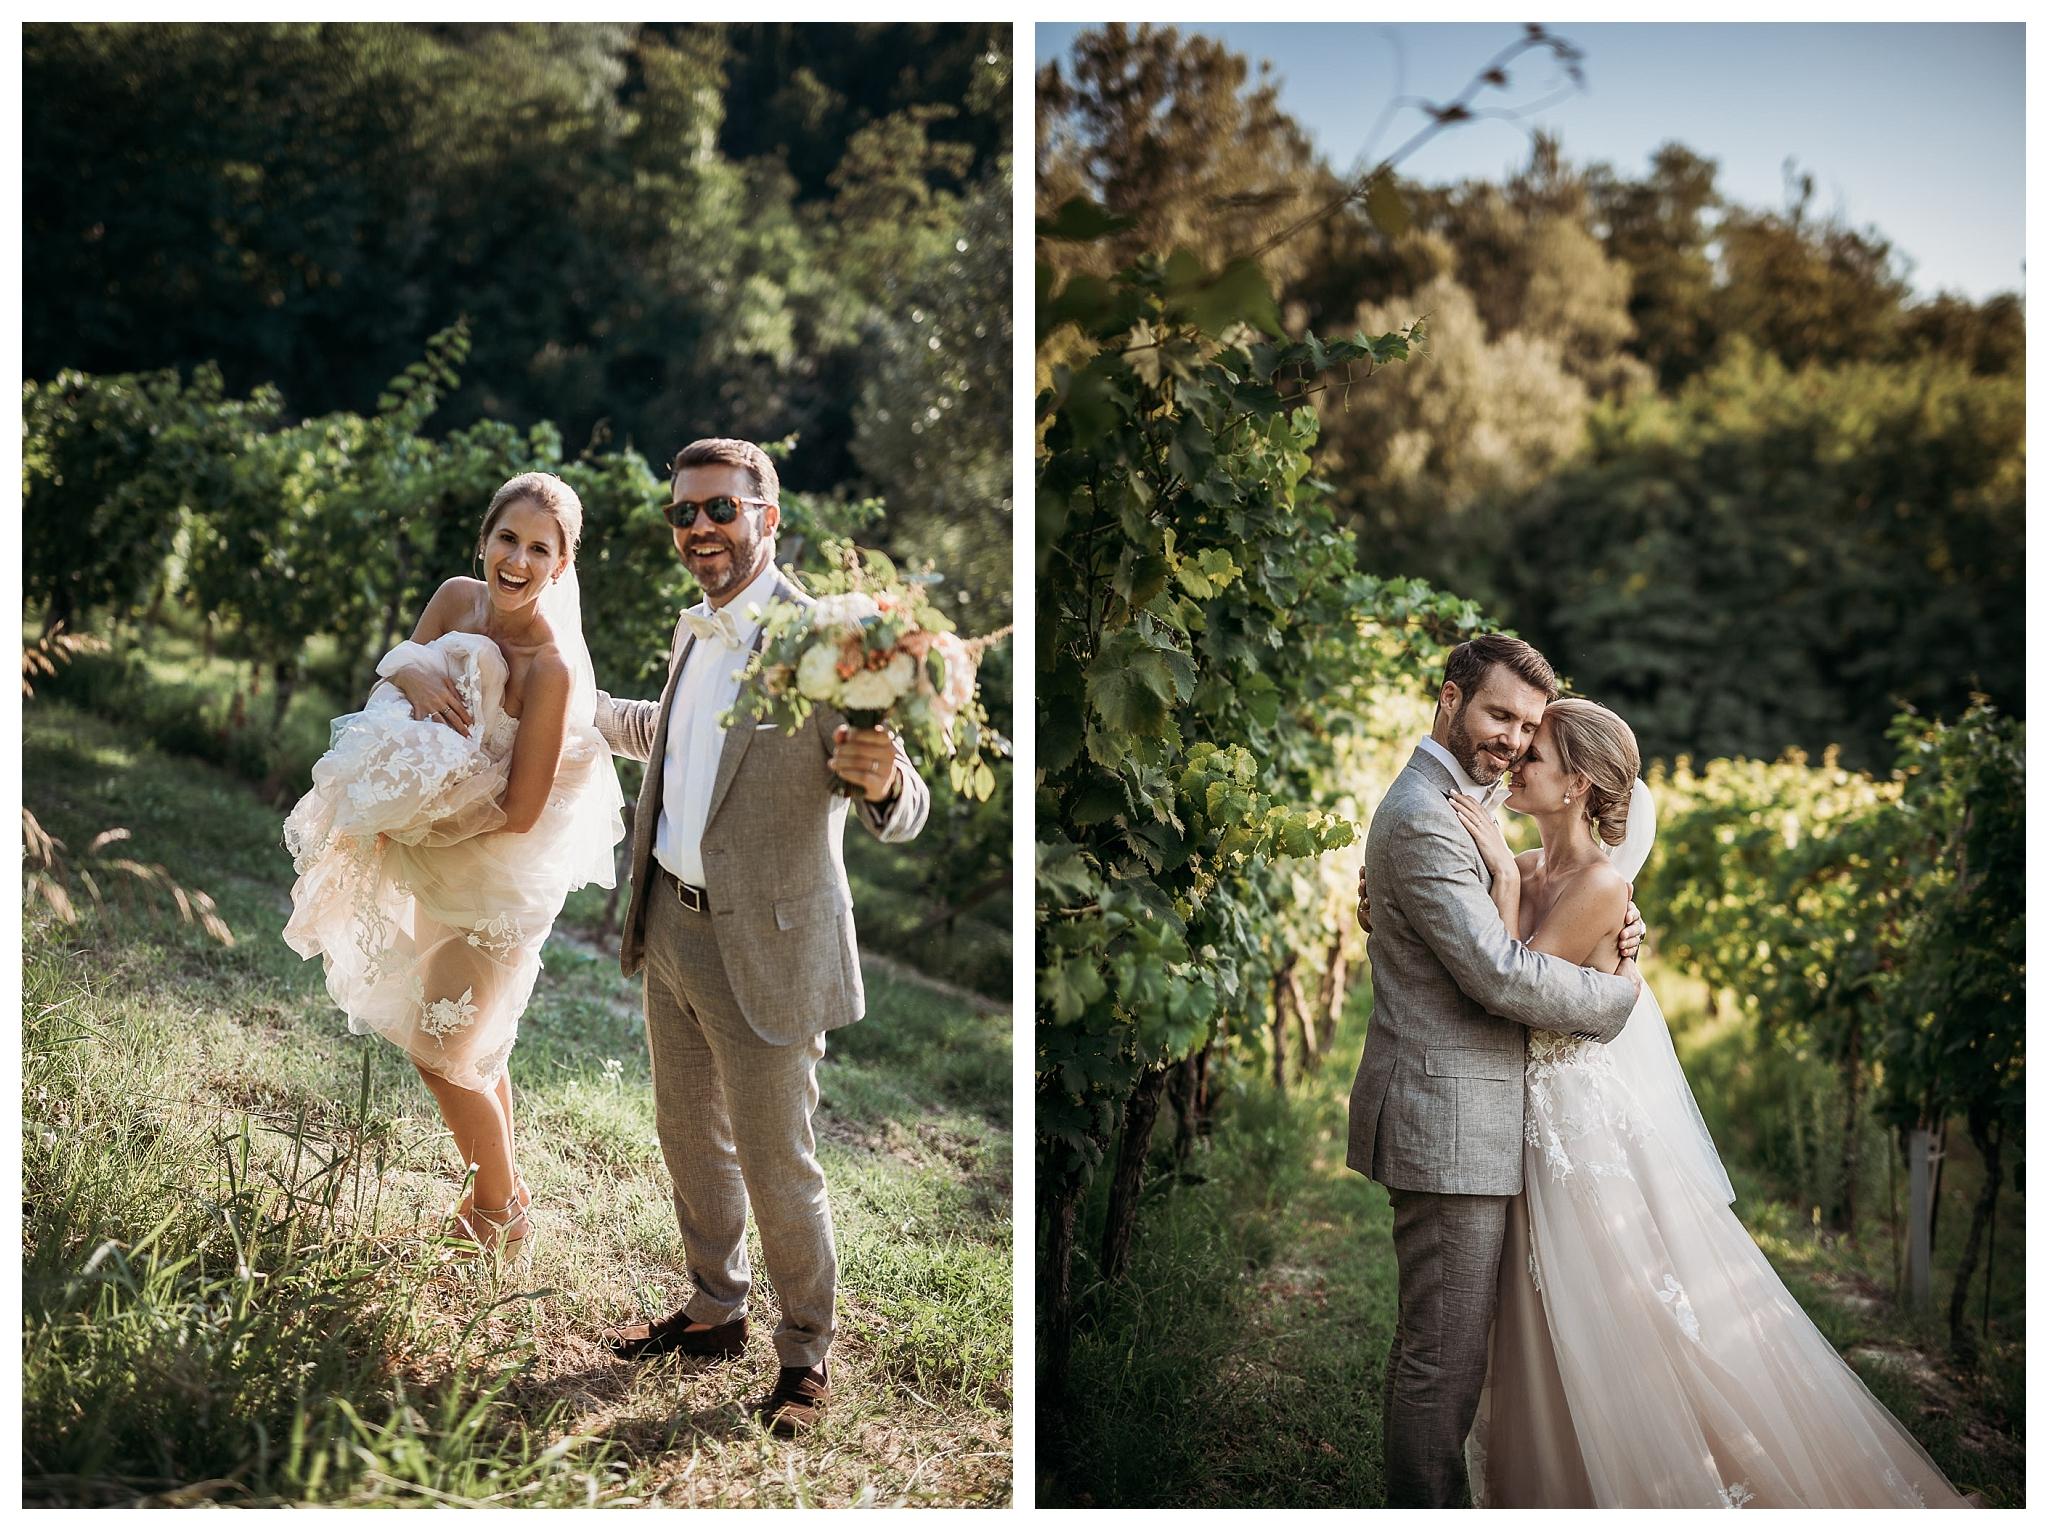 Couple in the vineyards in Monferrato